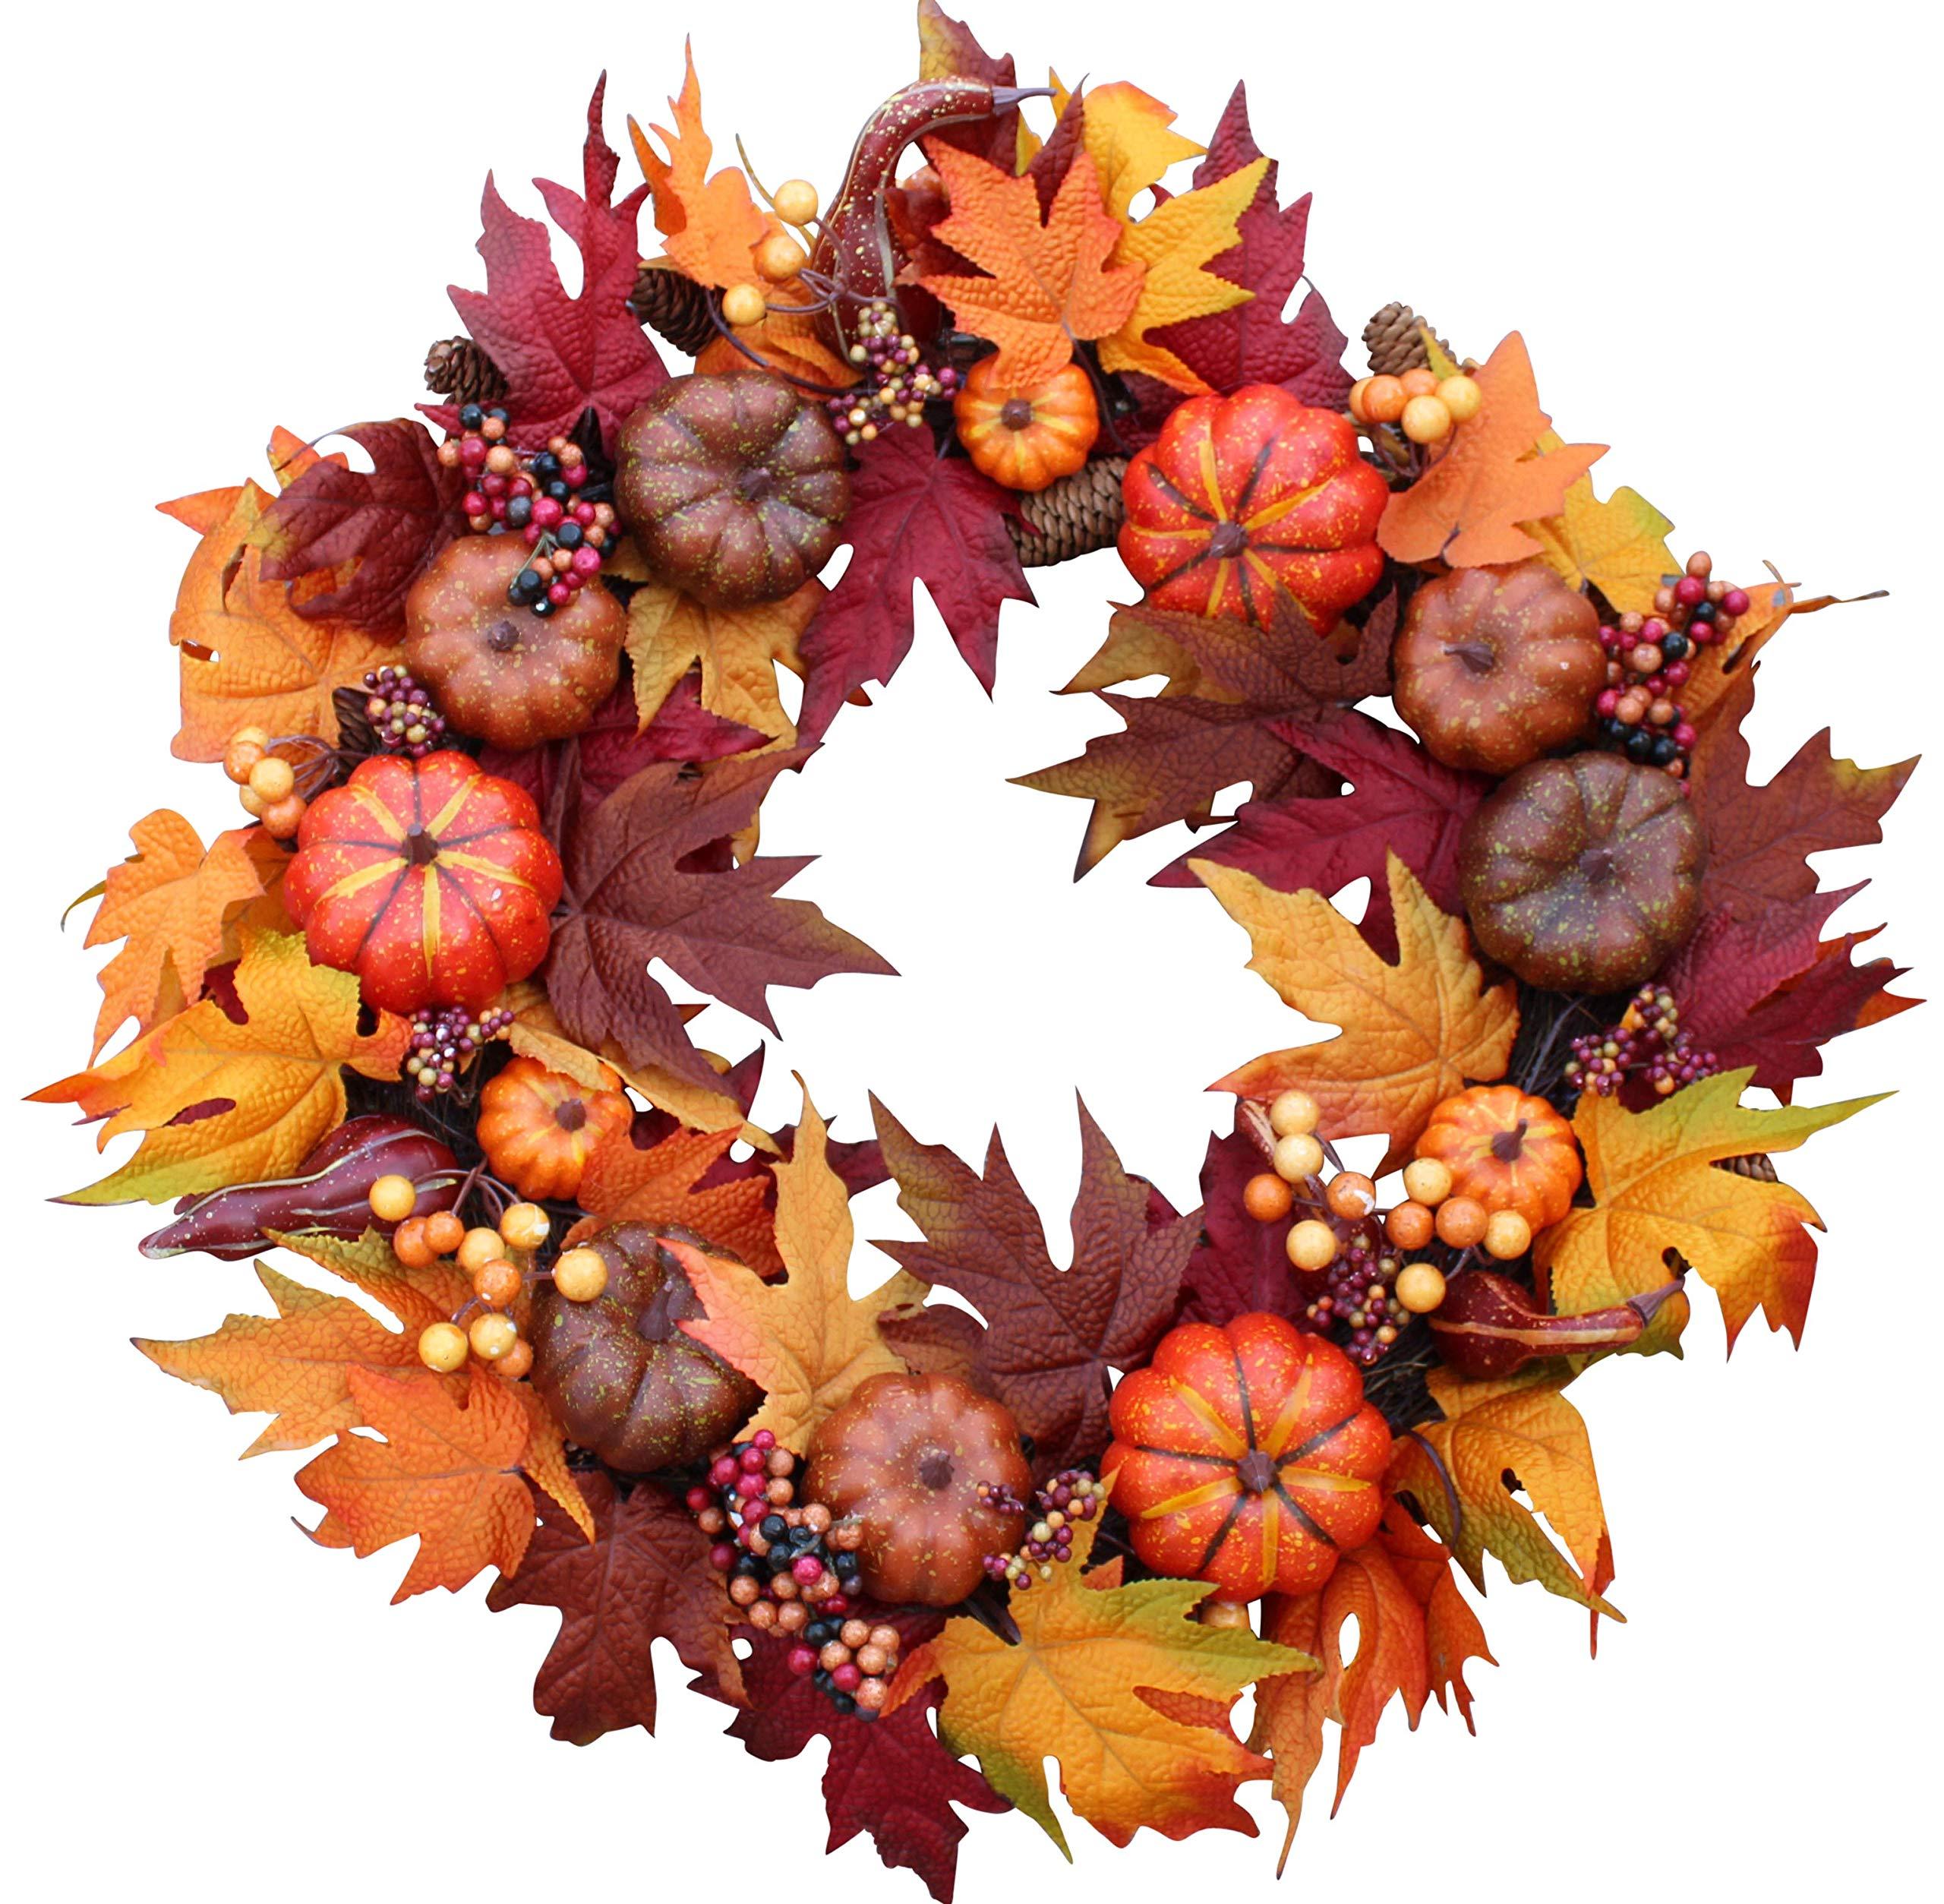 The-Wreath-Depot-Woodbury-Pumpkin-Harvest-Silk-Fall-Front-Door-Wreath-22-Inches